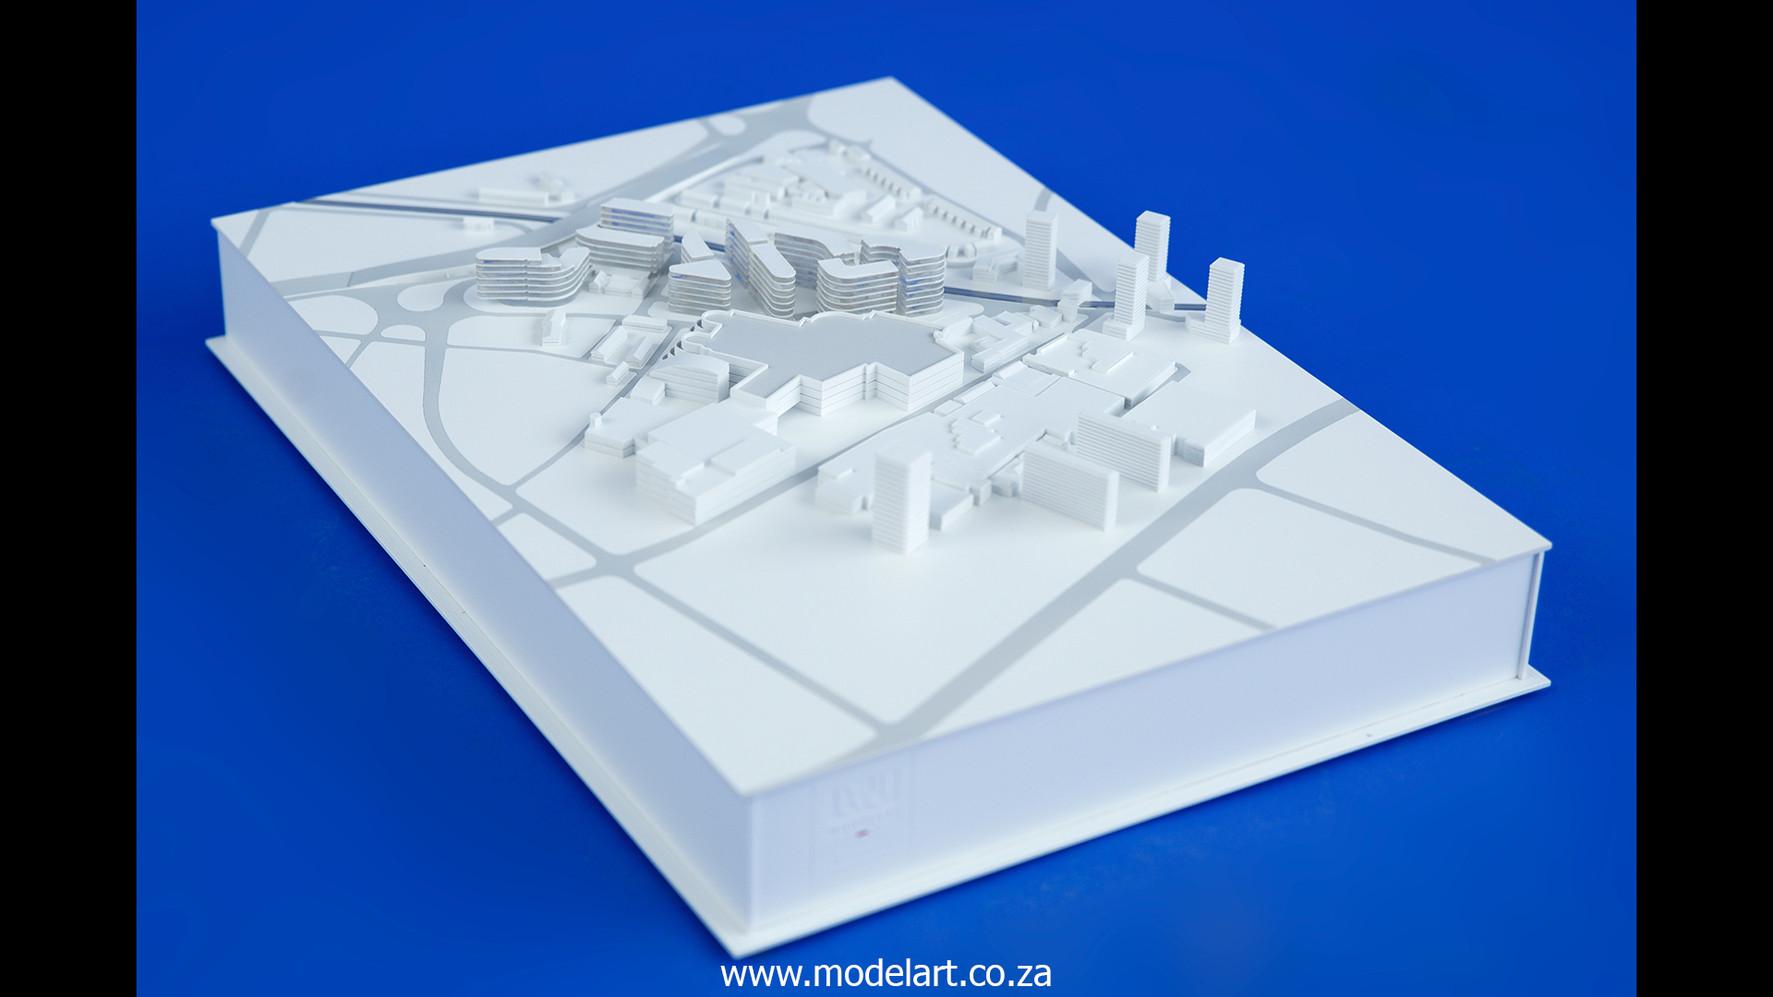 Architectural-Scale-Model-Conceptual-Croydon-1